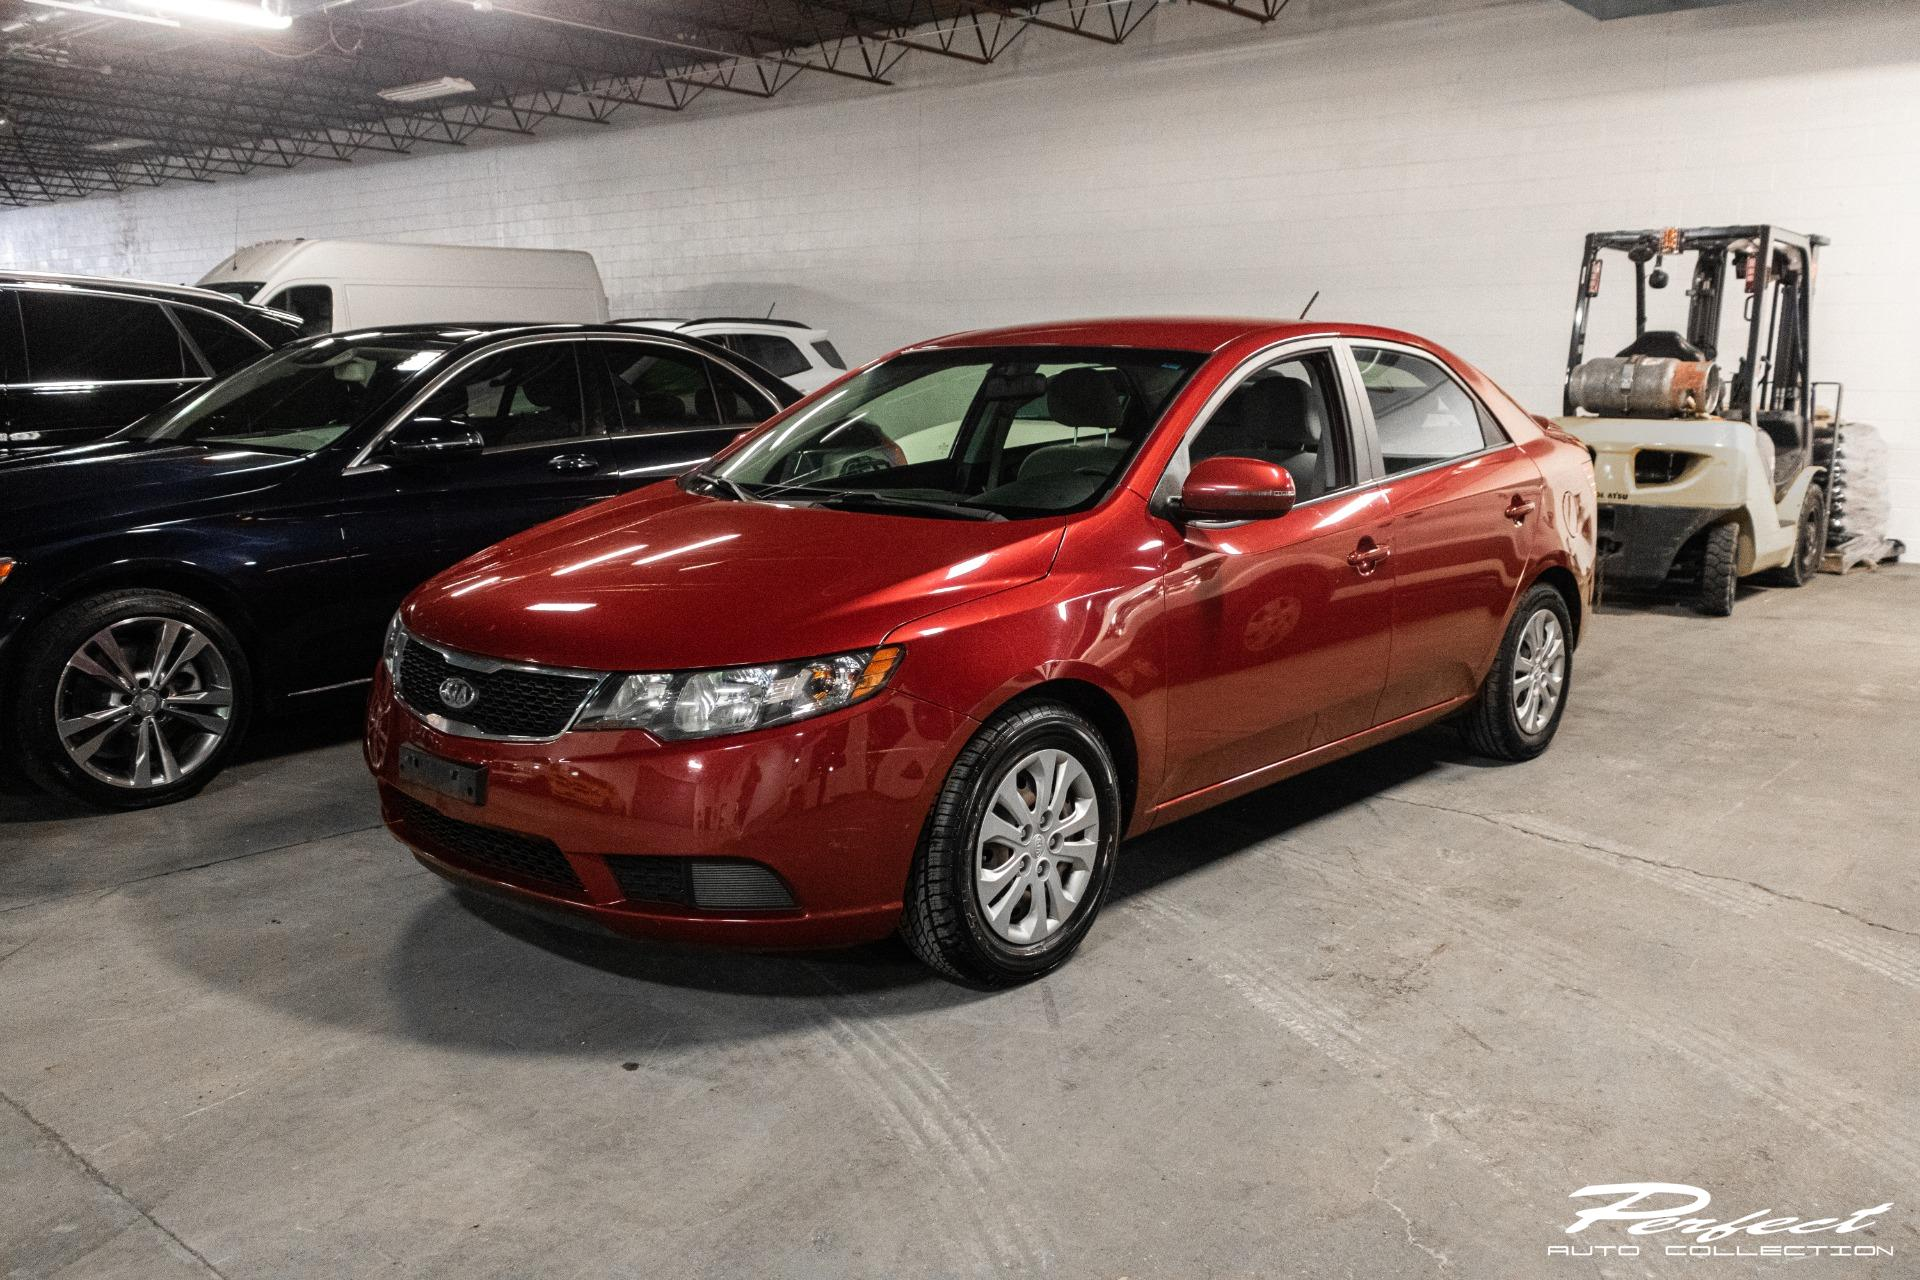 Used 2011 Kia Forte EX